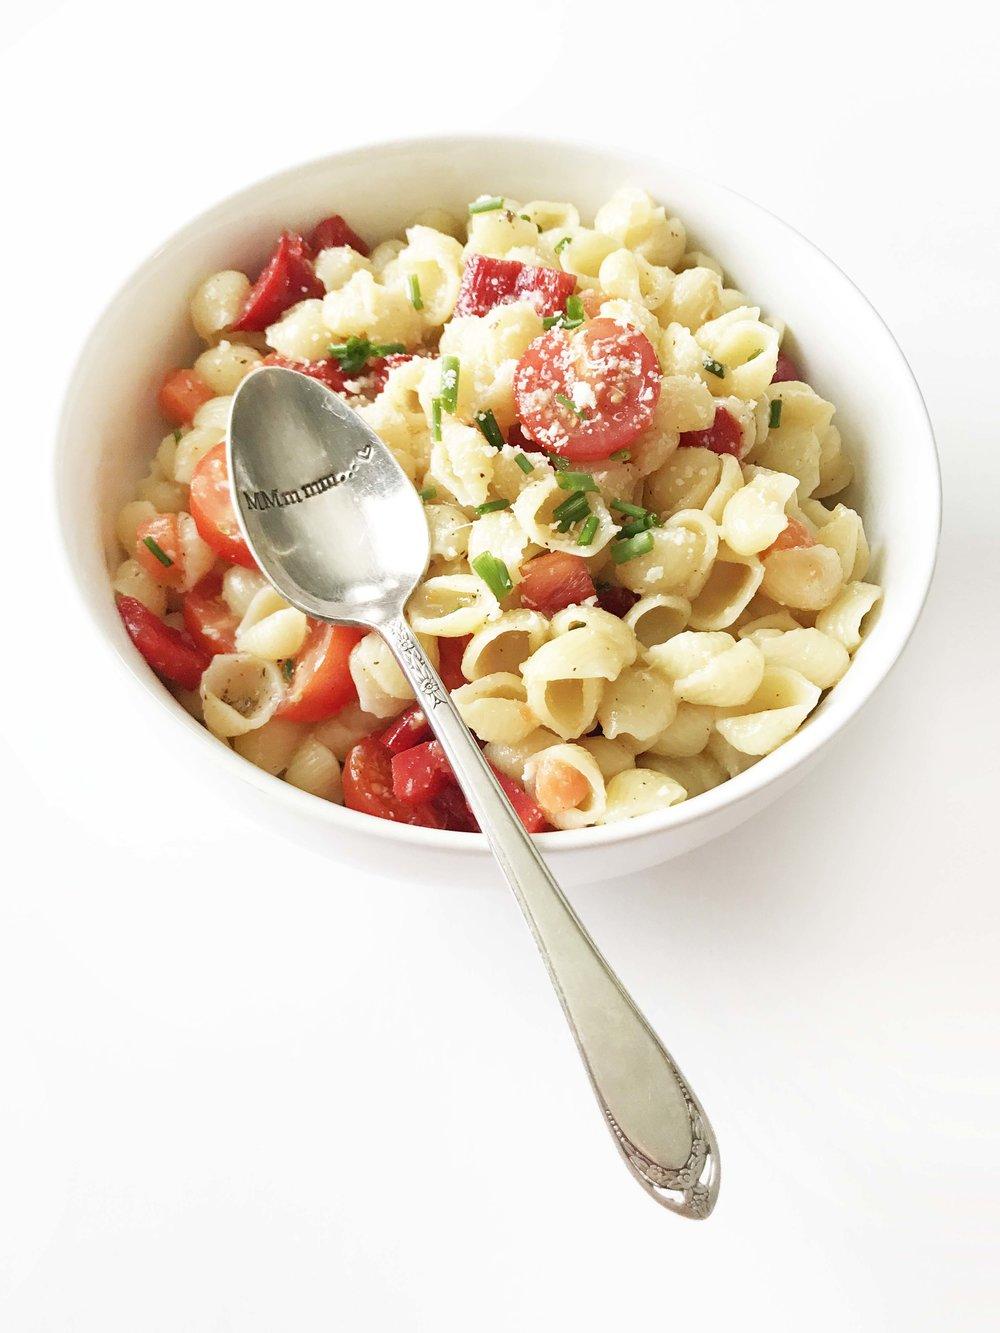 seashell-pasta-salad5.jpg